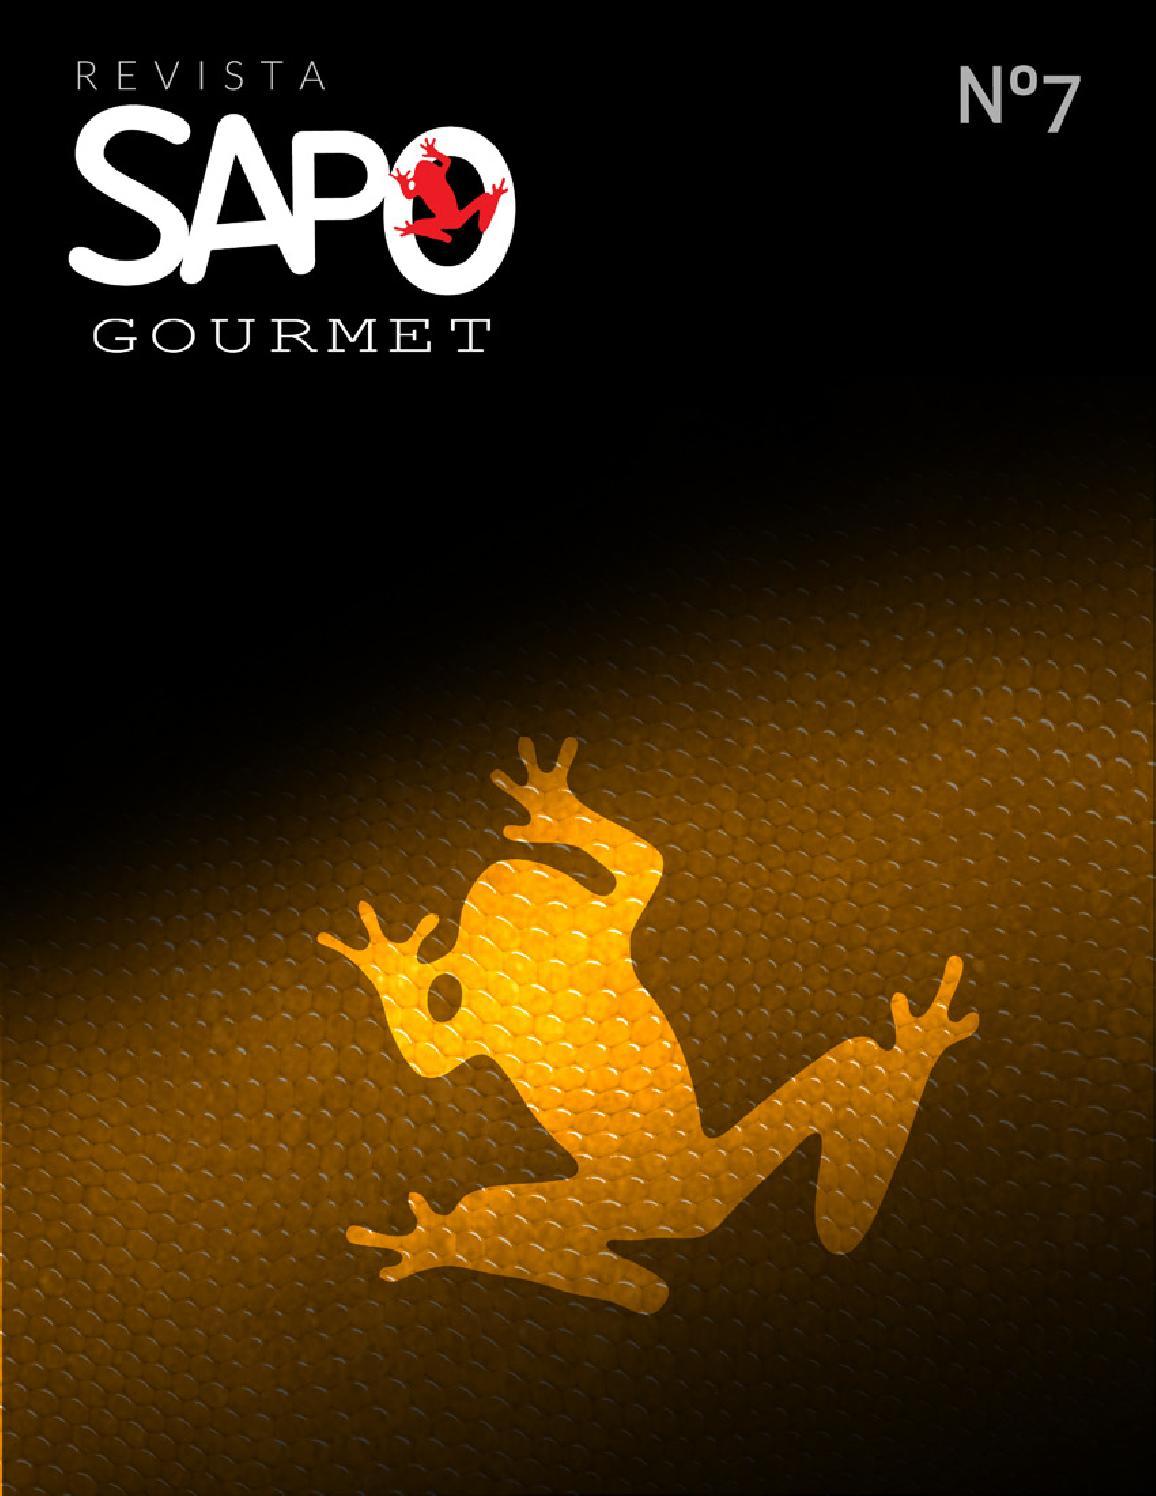 Revista Sapo Gourmet 10 by Revista Sapo - issuu